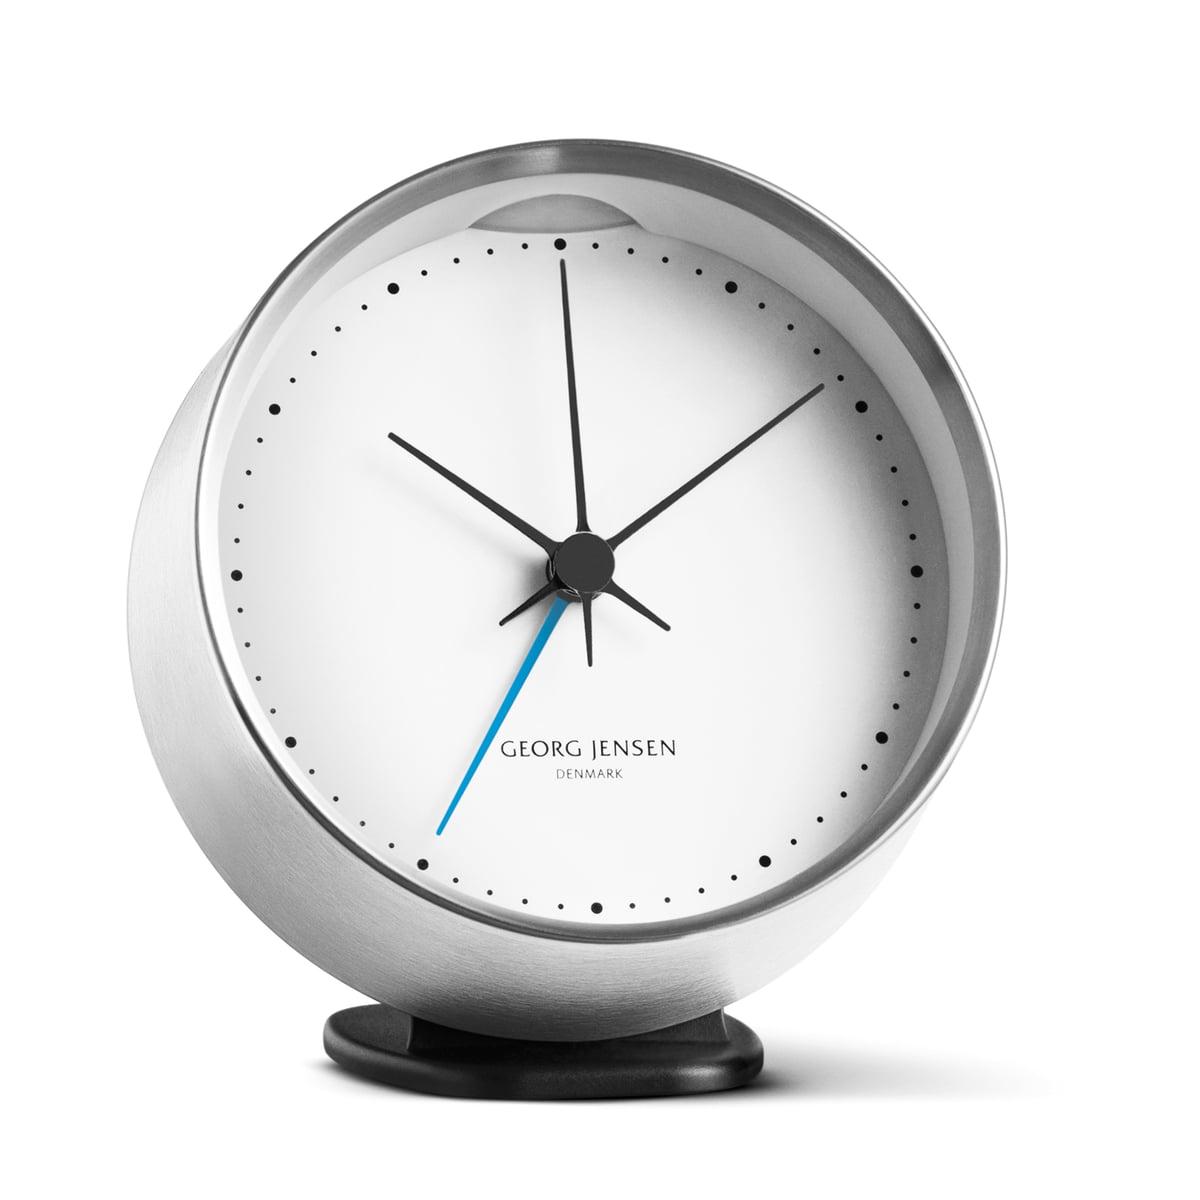 Georg Jensen - Henning Koppel Wecker, Edelstahl | Dekoration > Uhren > Wecker | Edelstahl | Edelstahl -  abs-kunststoff| edelstahl| abs-kunststoff | Georg Jensen